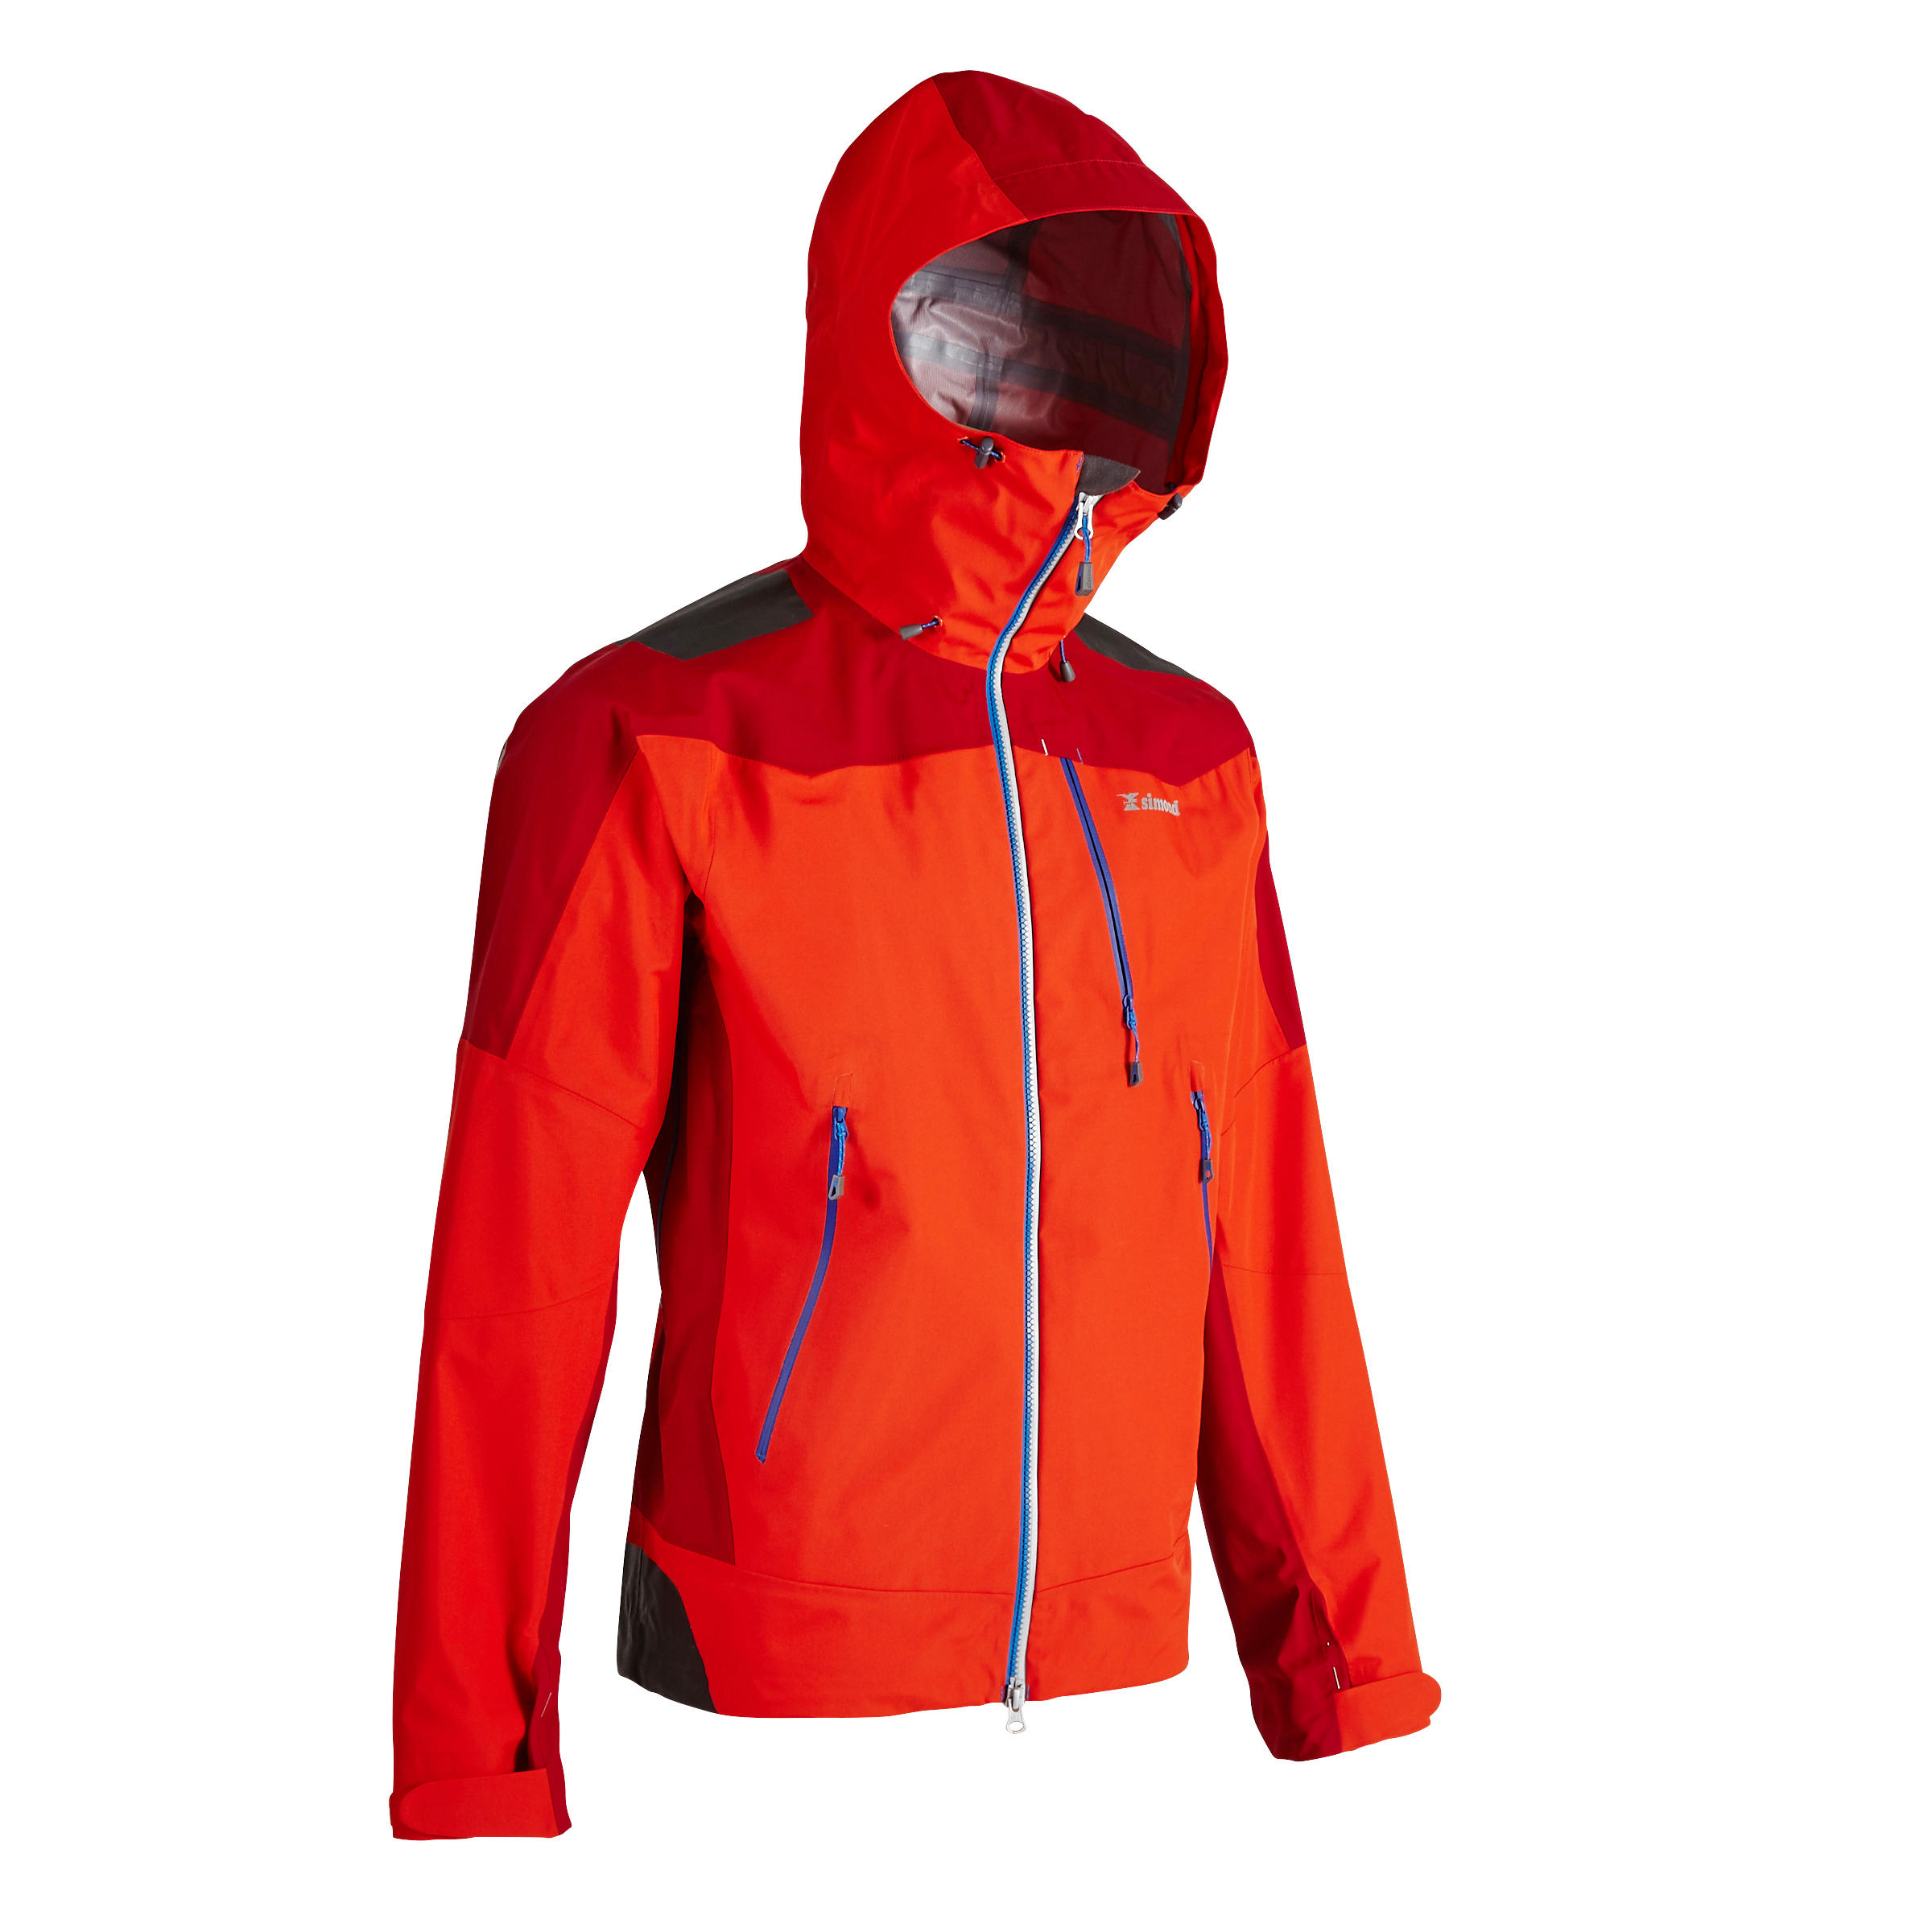 ALPI M VER Jacket